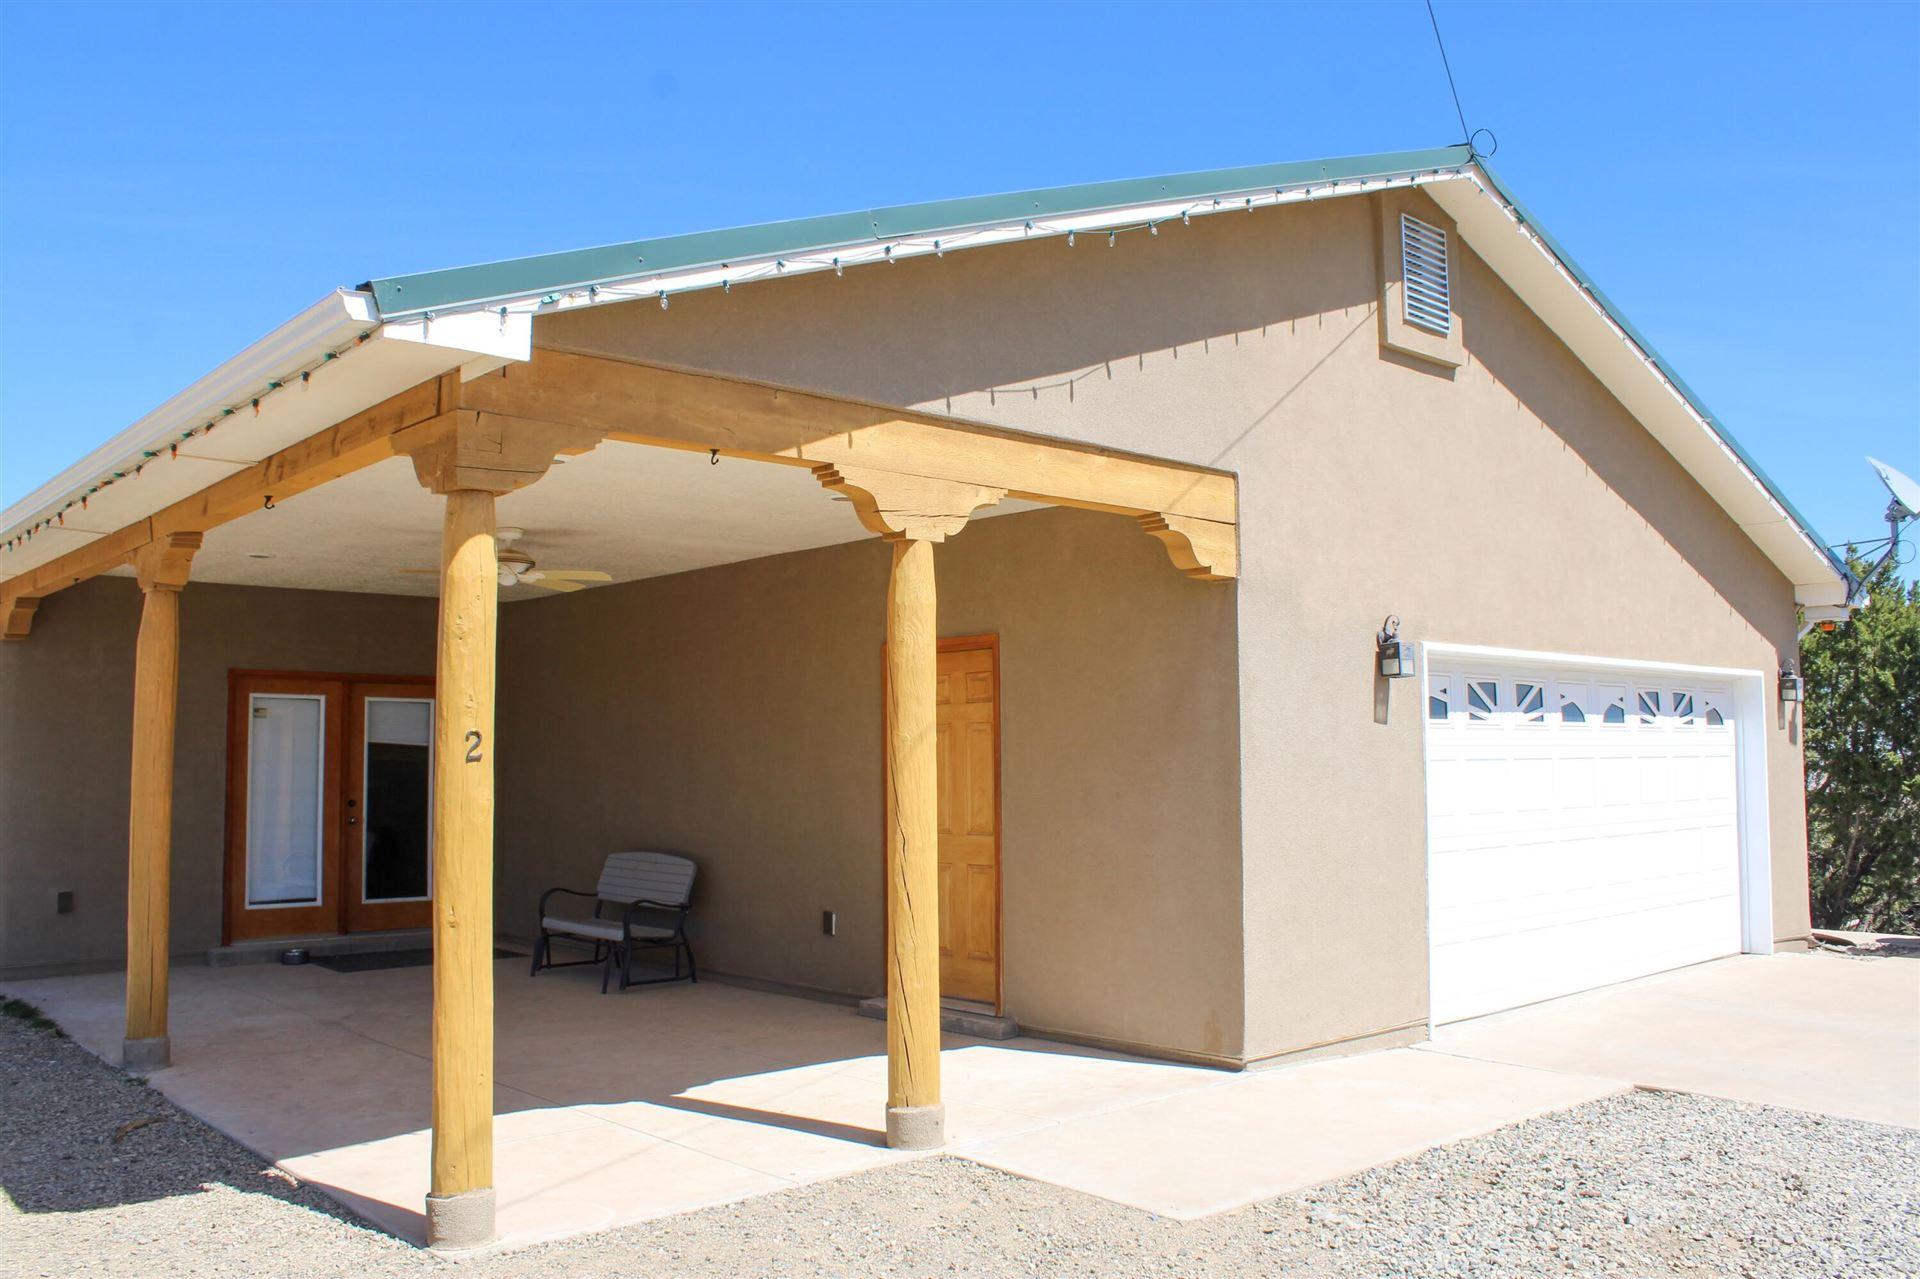 Photo for 2 HILLTOP Road, Edgewood, NM 87015 (MLS # 988650)